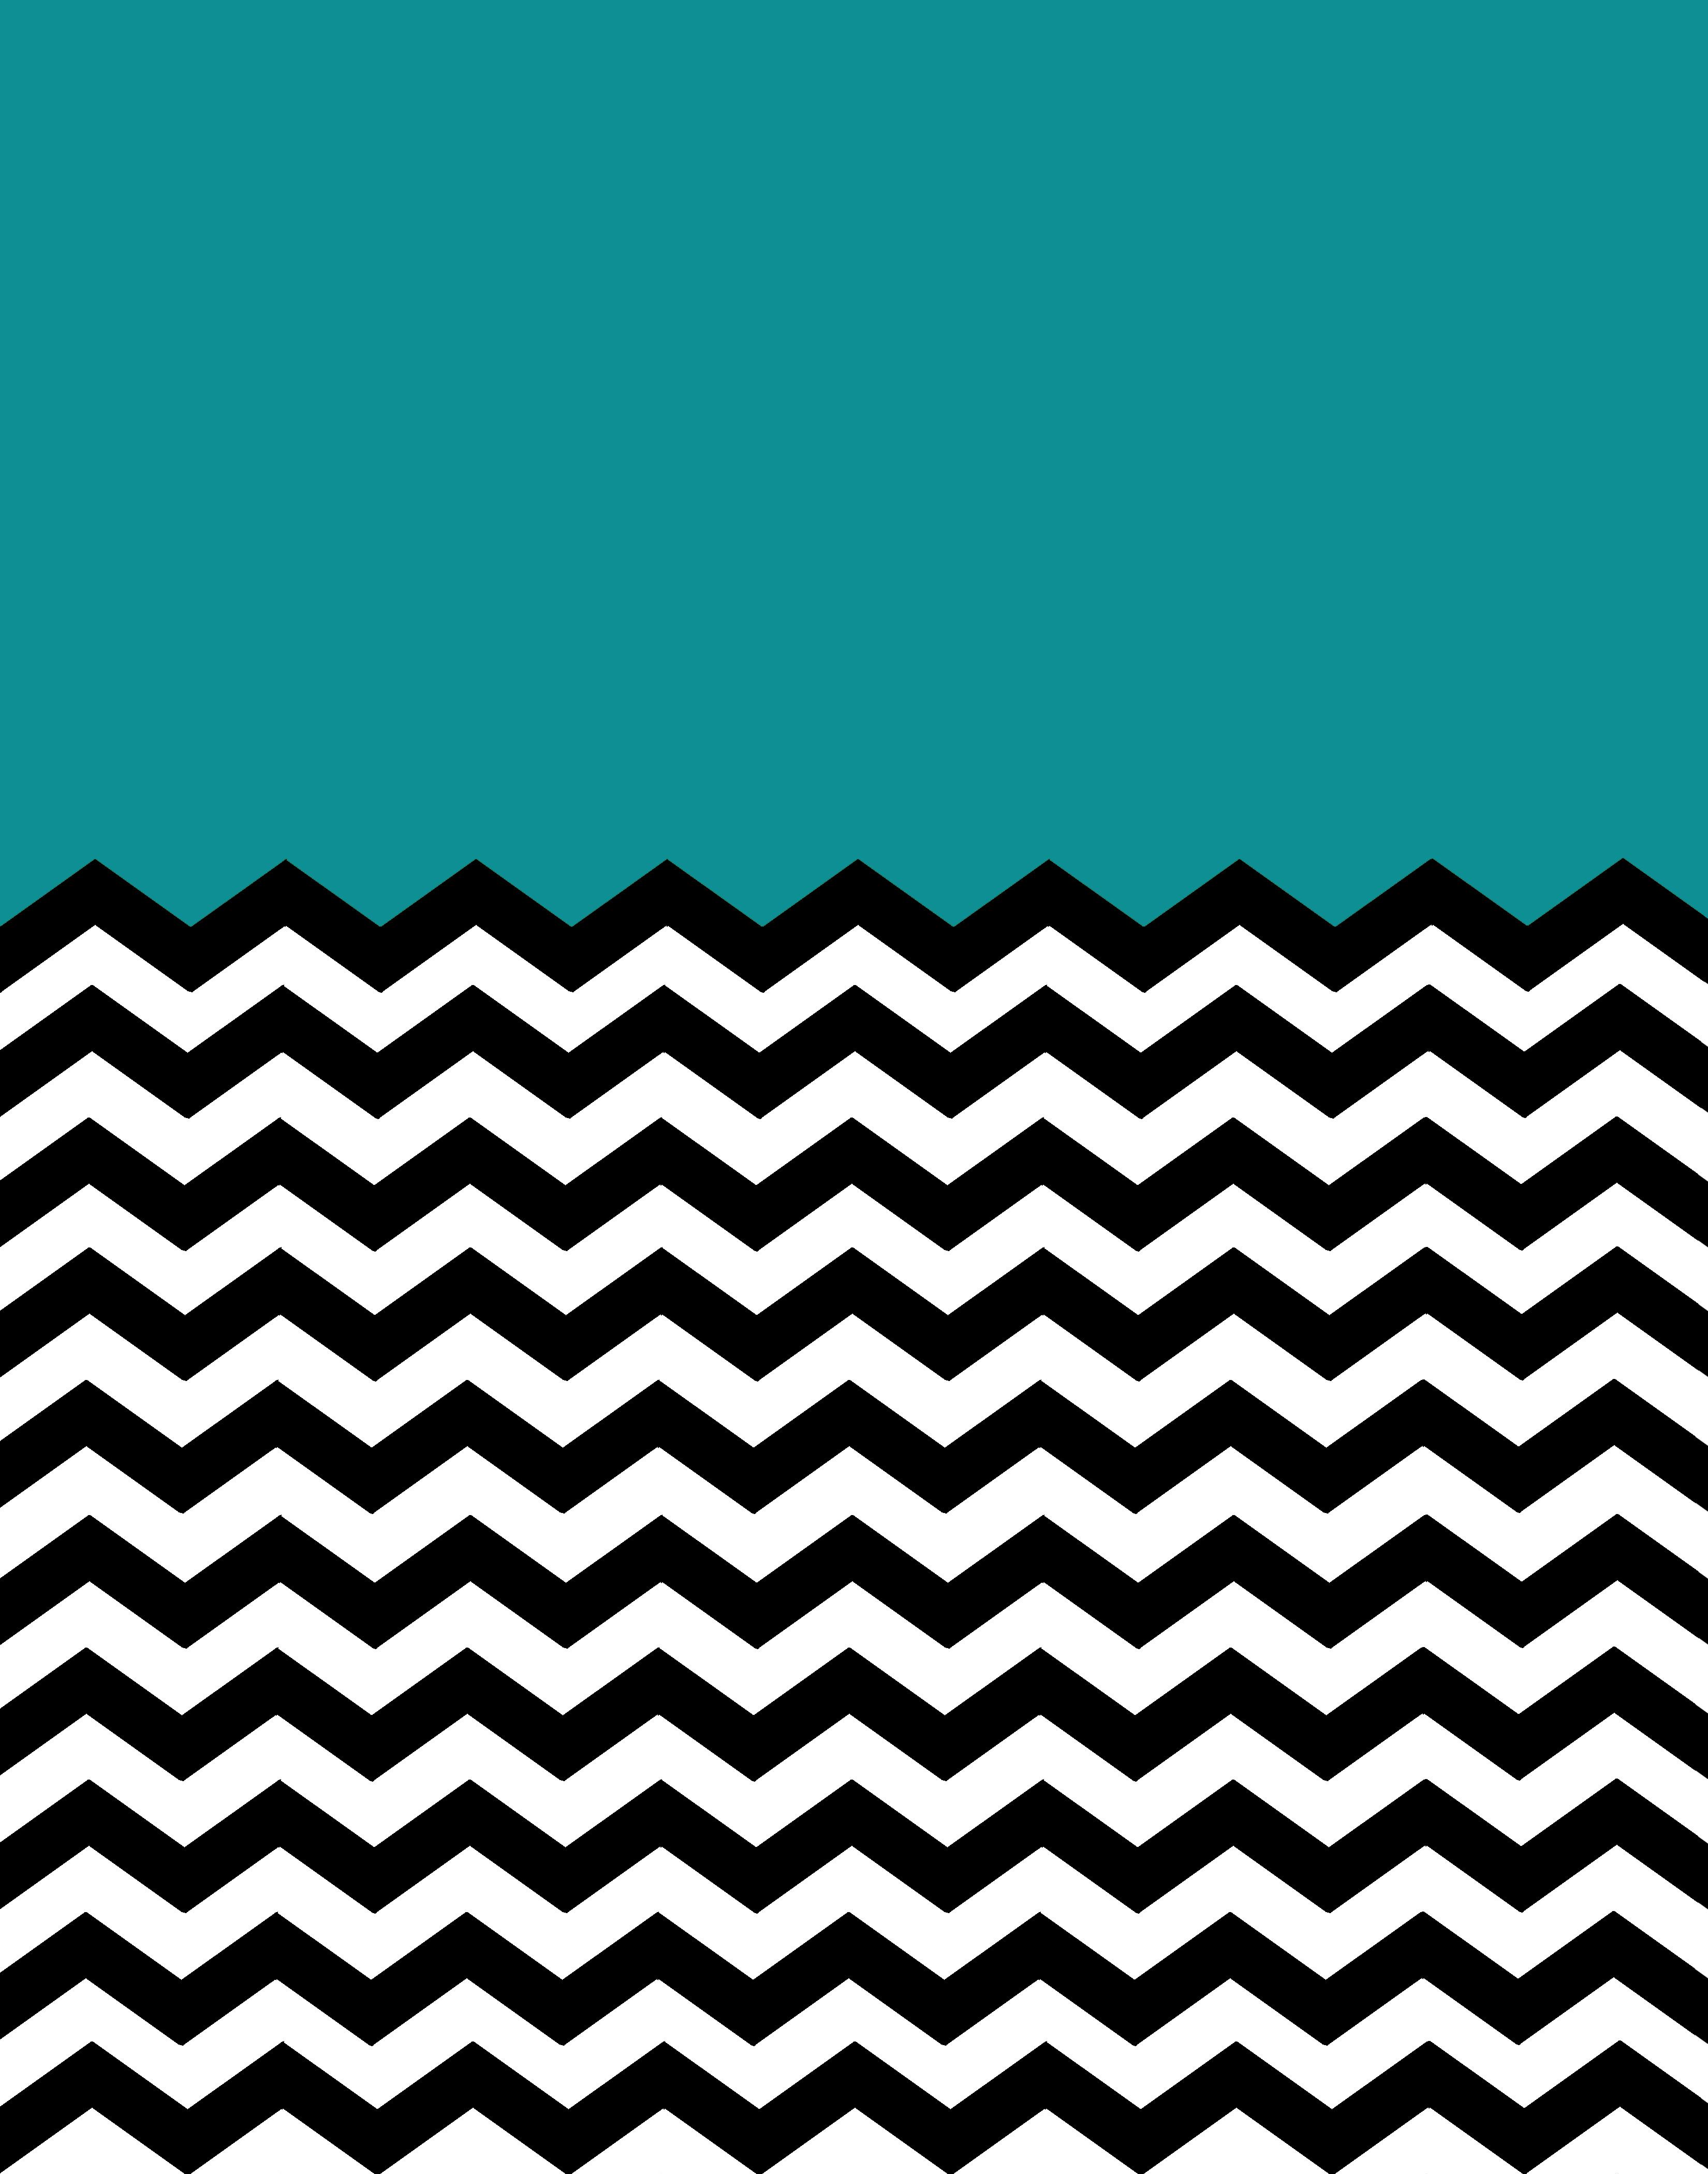 [50+] Coral Chevron Wallpaper on WallpaperSafari